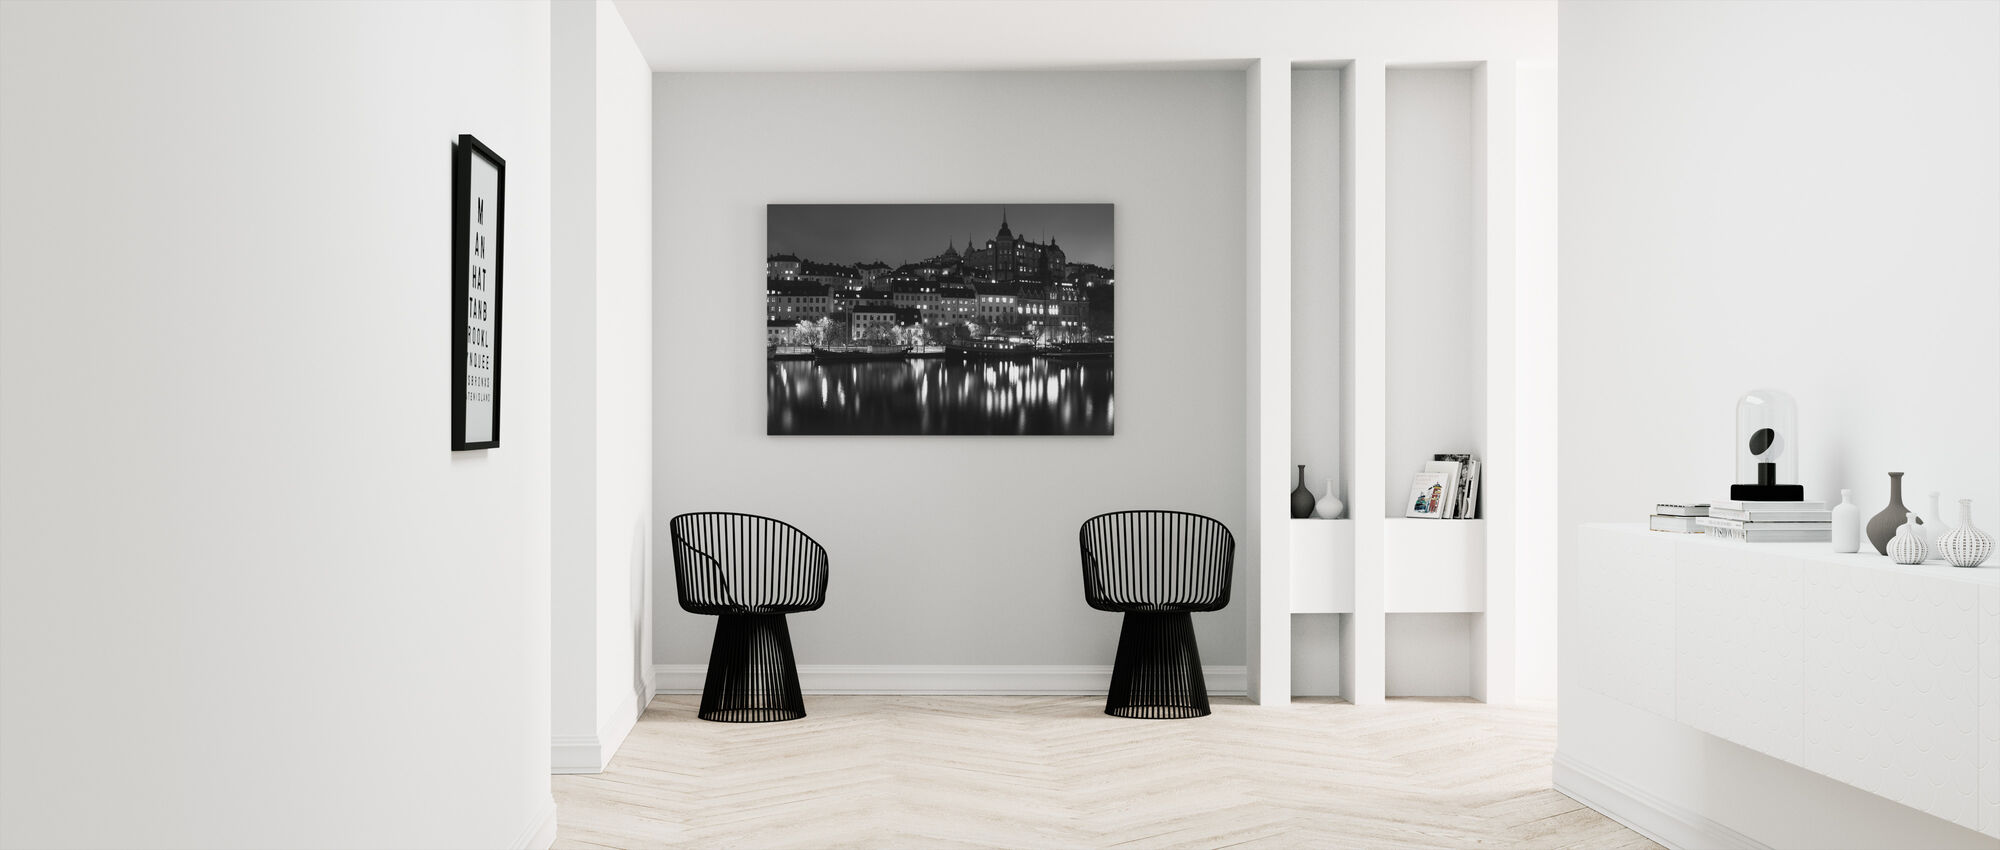 Lights in Stockholm - Canvas print - Hallway